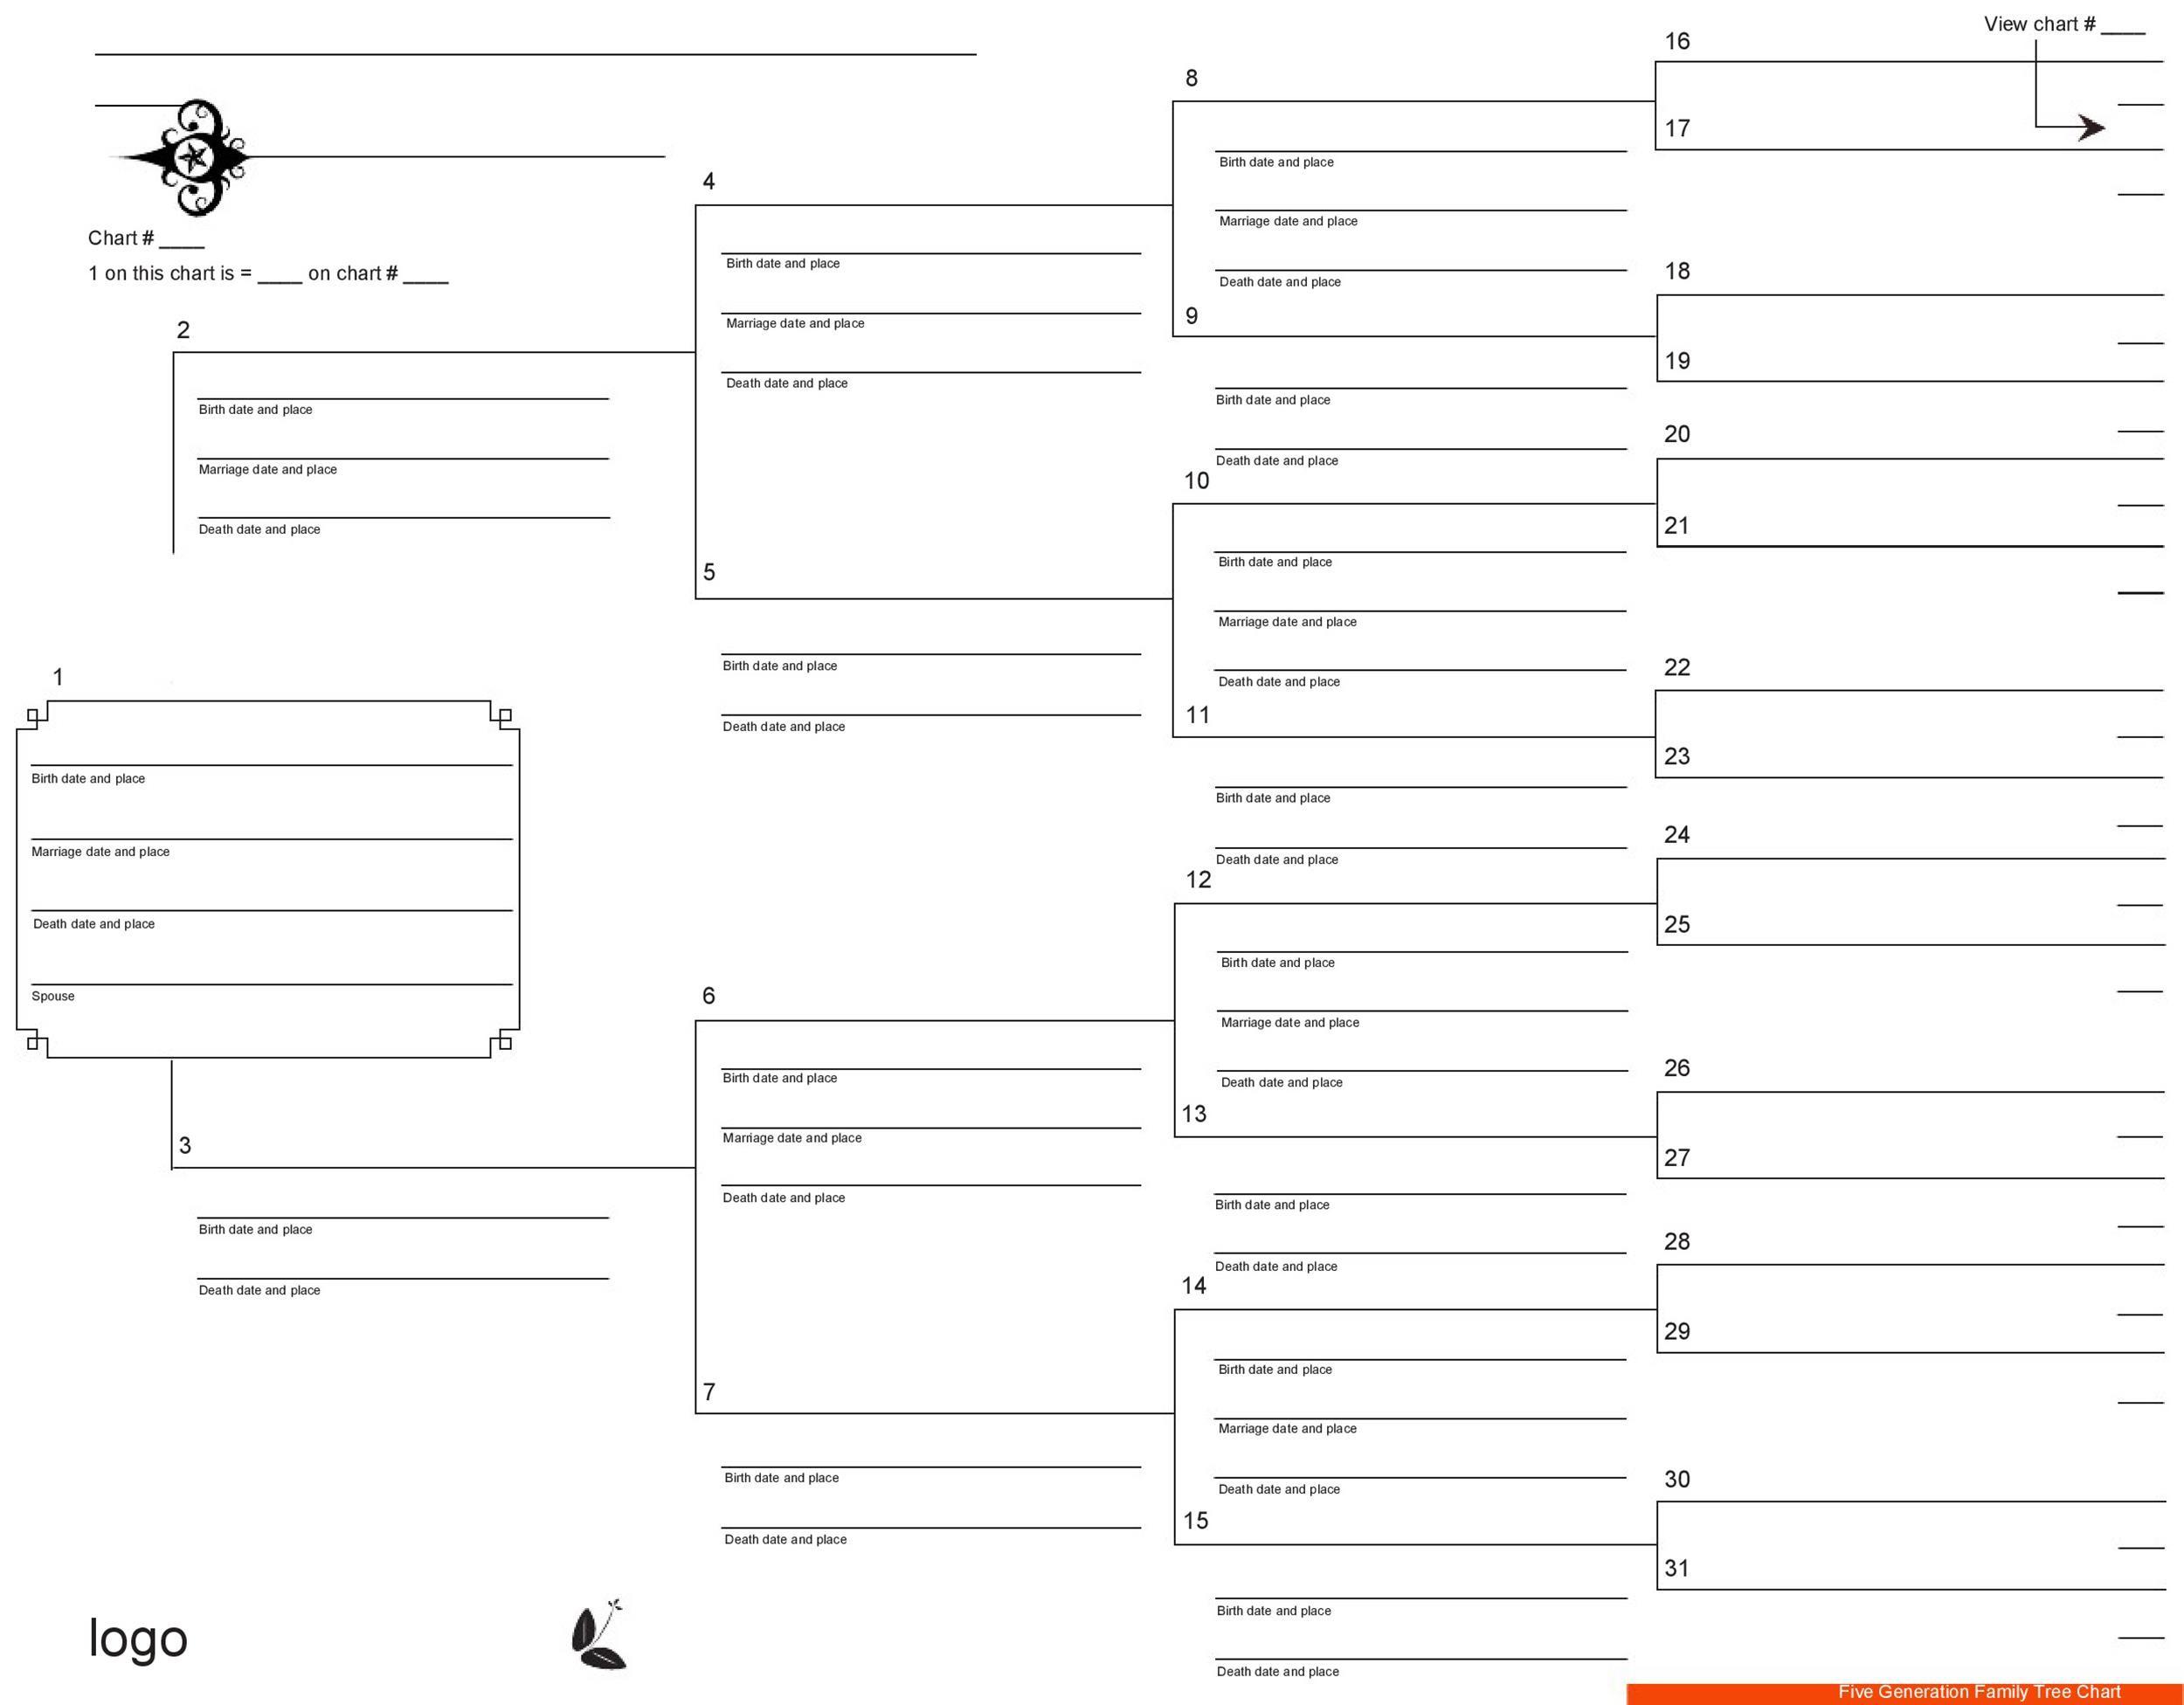 30 Free Genogram Templates  Symbols - Template Lab - genogram template